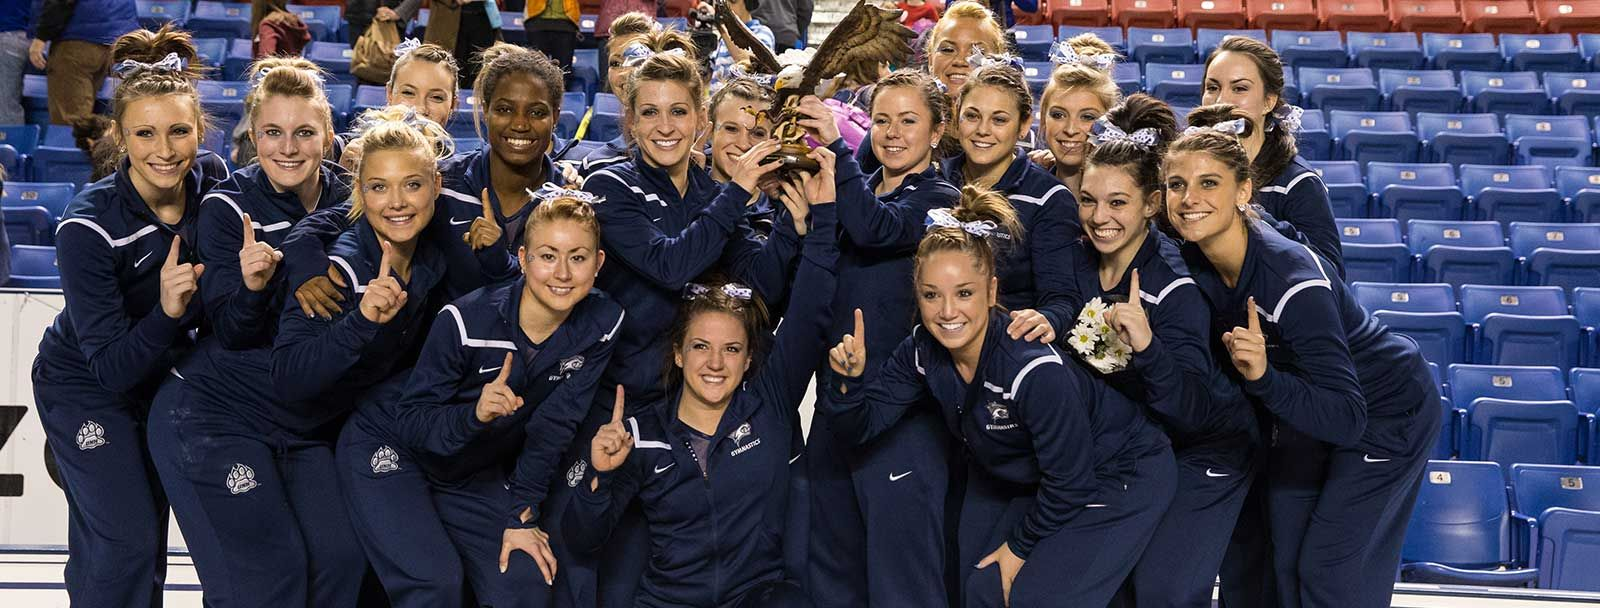 University of New Hampshire gymnastics team 2013-2014